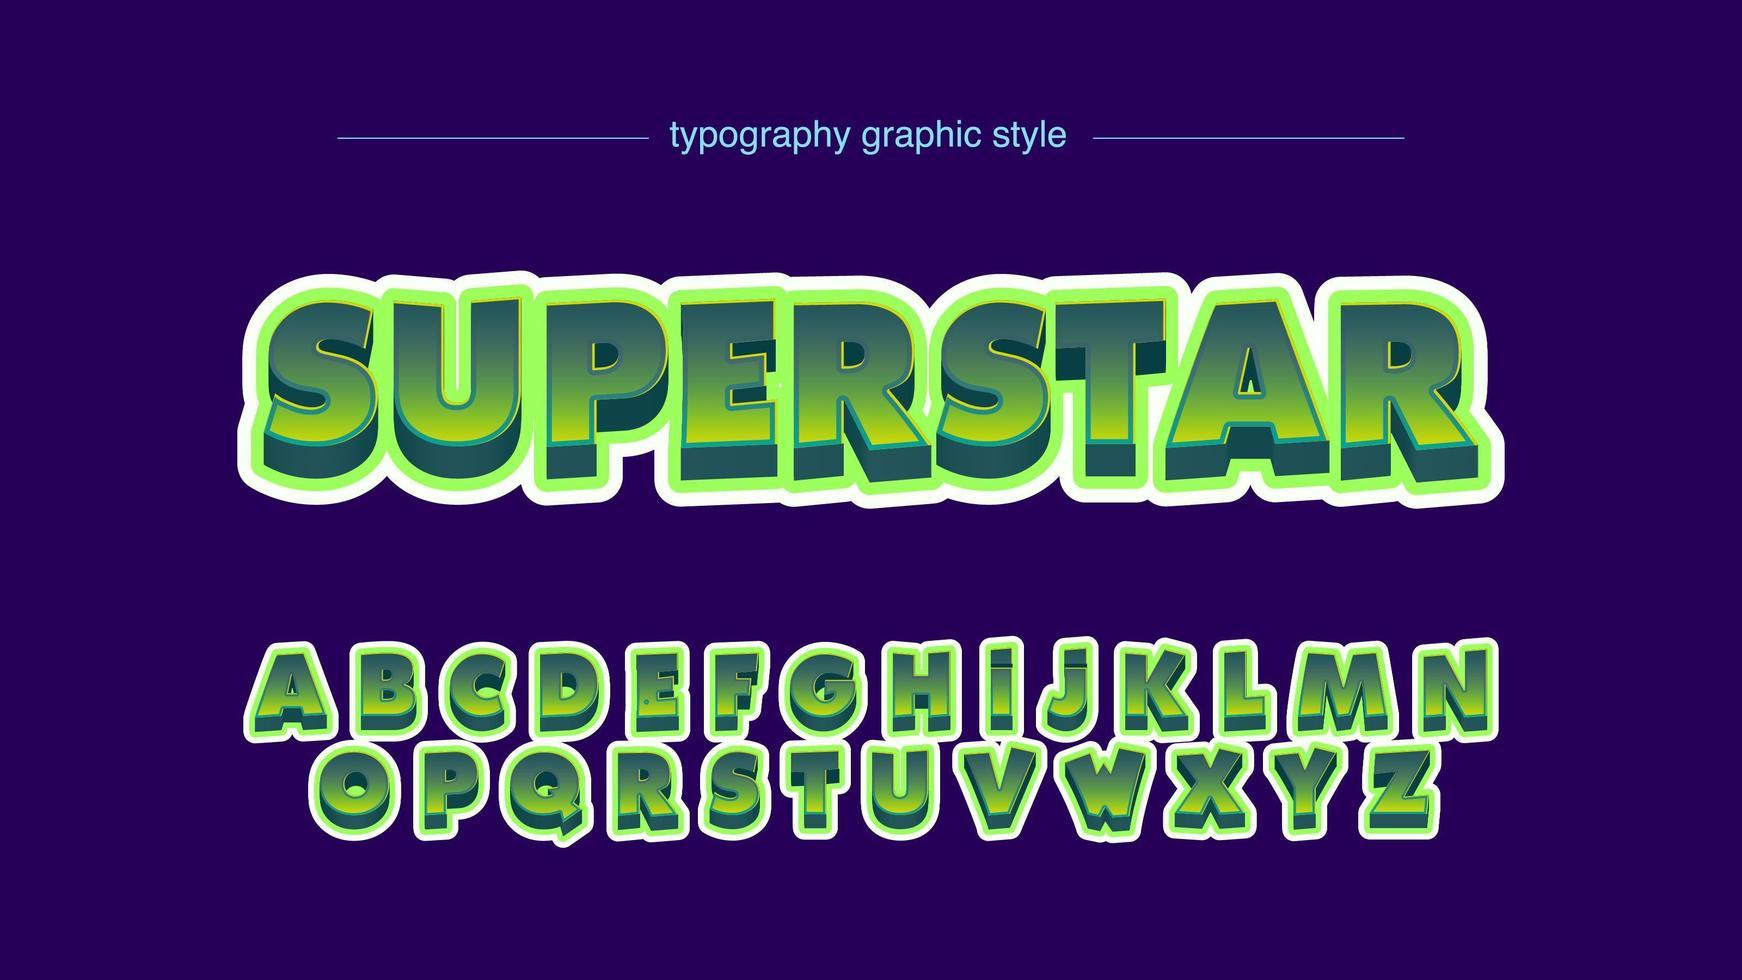 super fet grön 3d tecknad typografi vektor